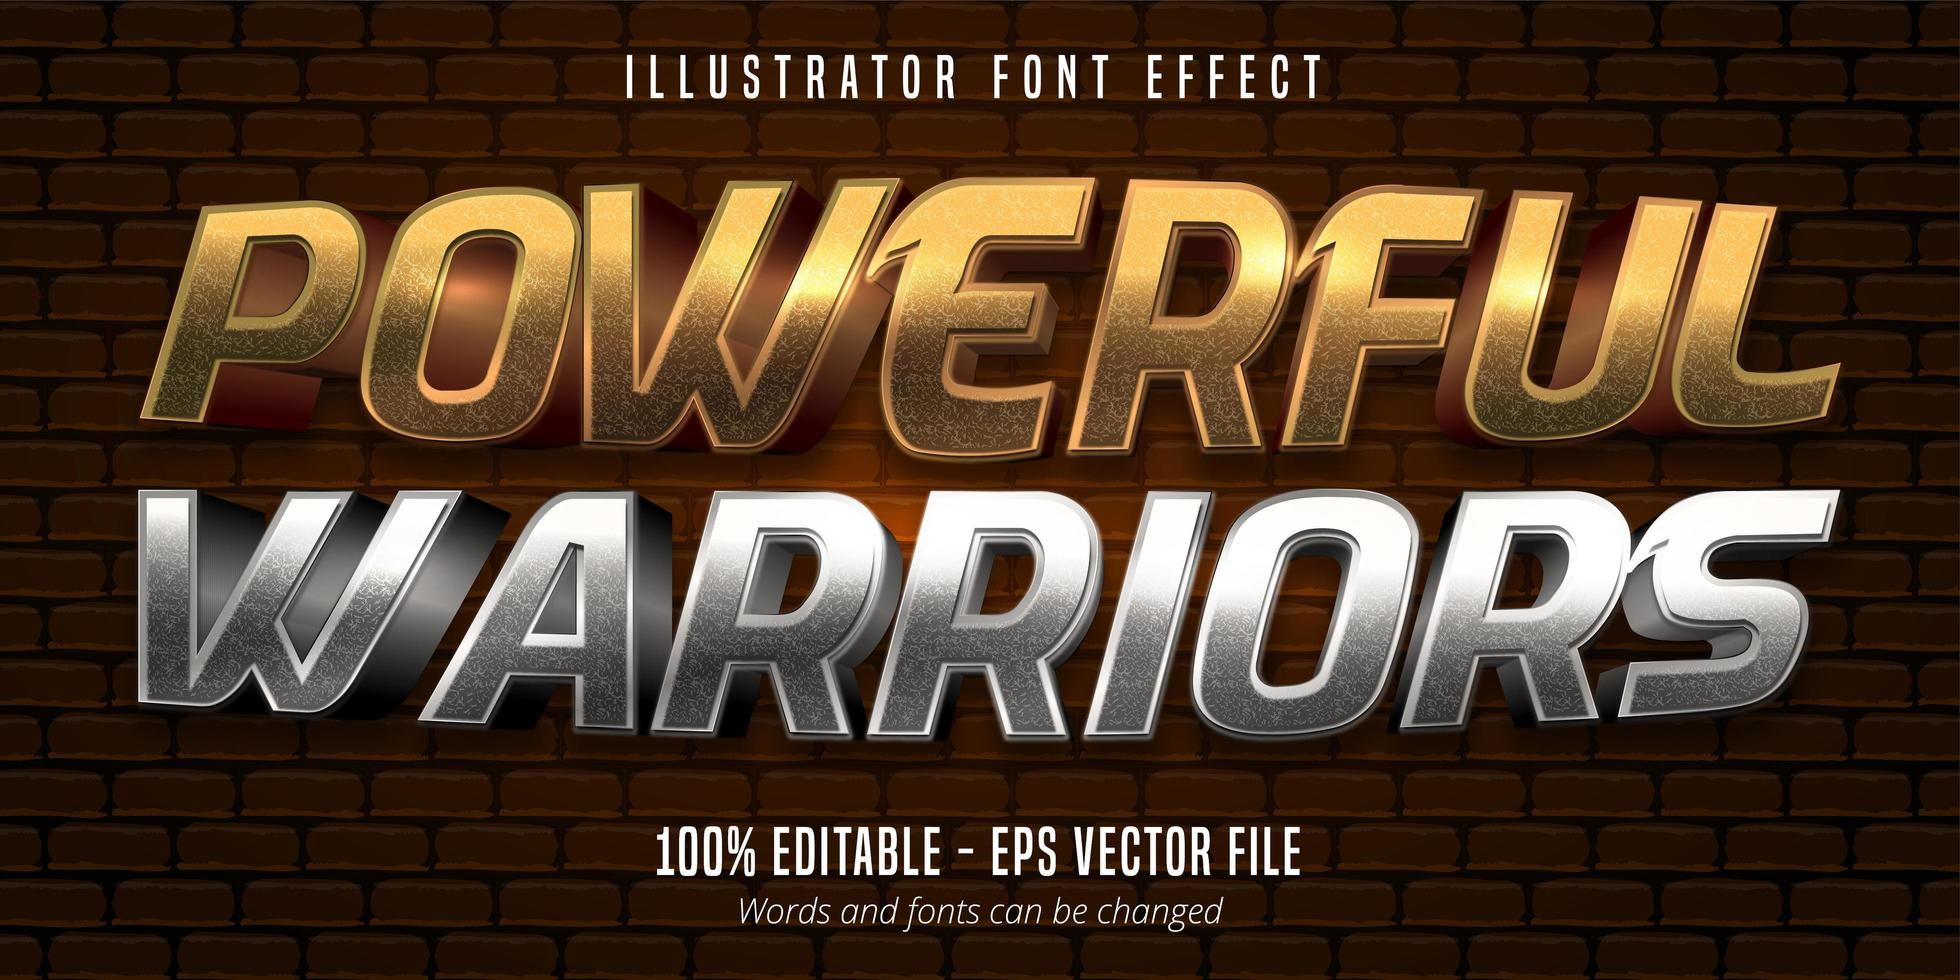 texto de guerreiros poderosos, efeito de fonte editável do estilo metálico ouro e prata 3d vetor